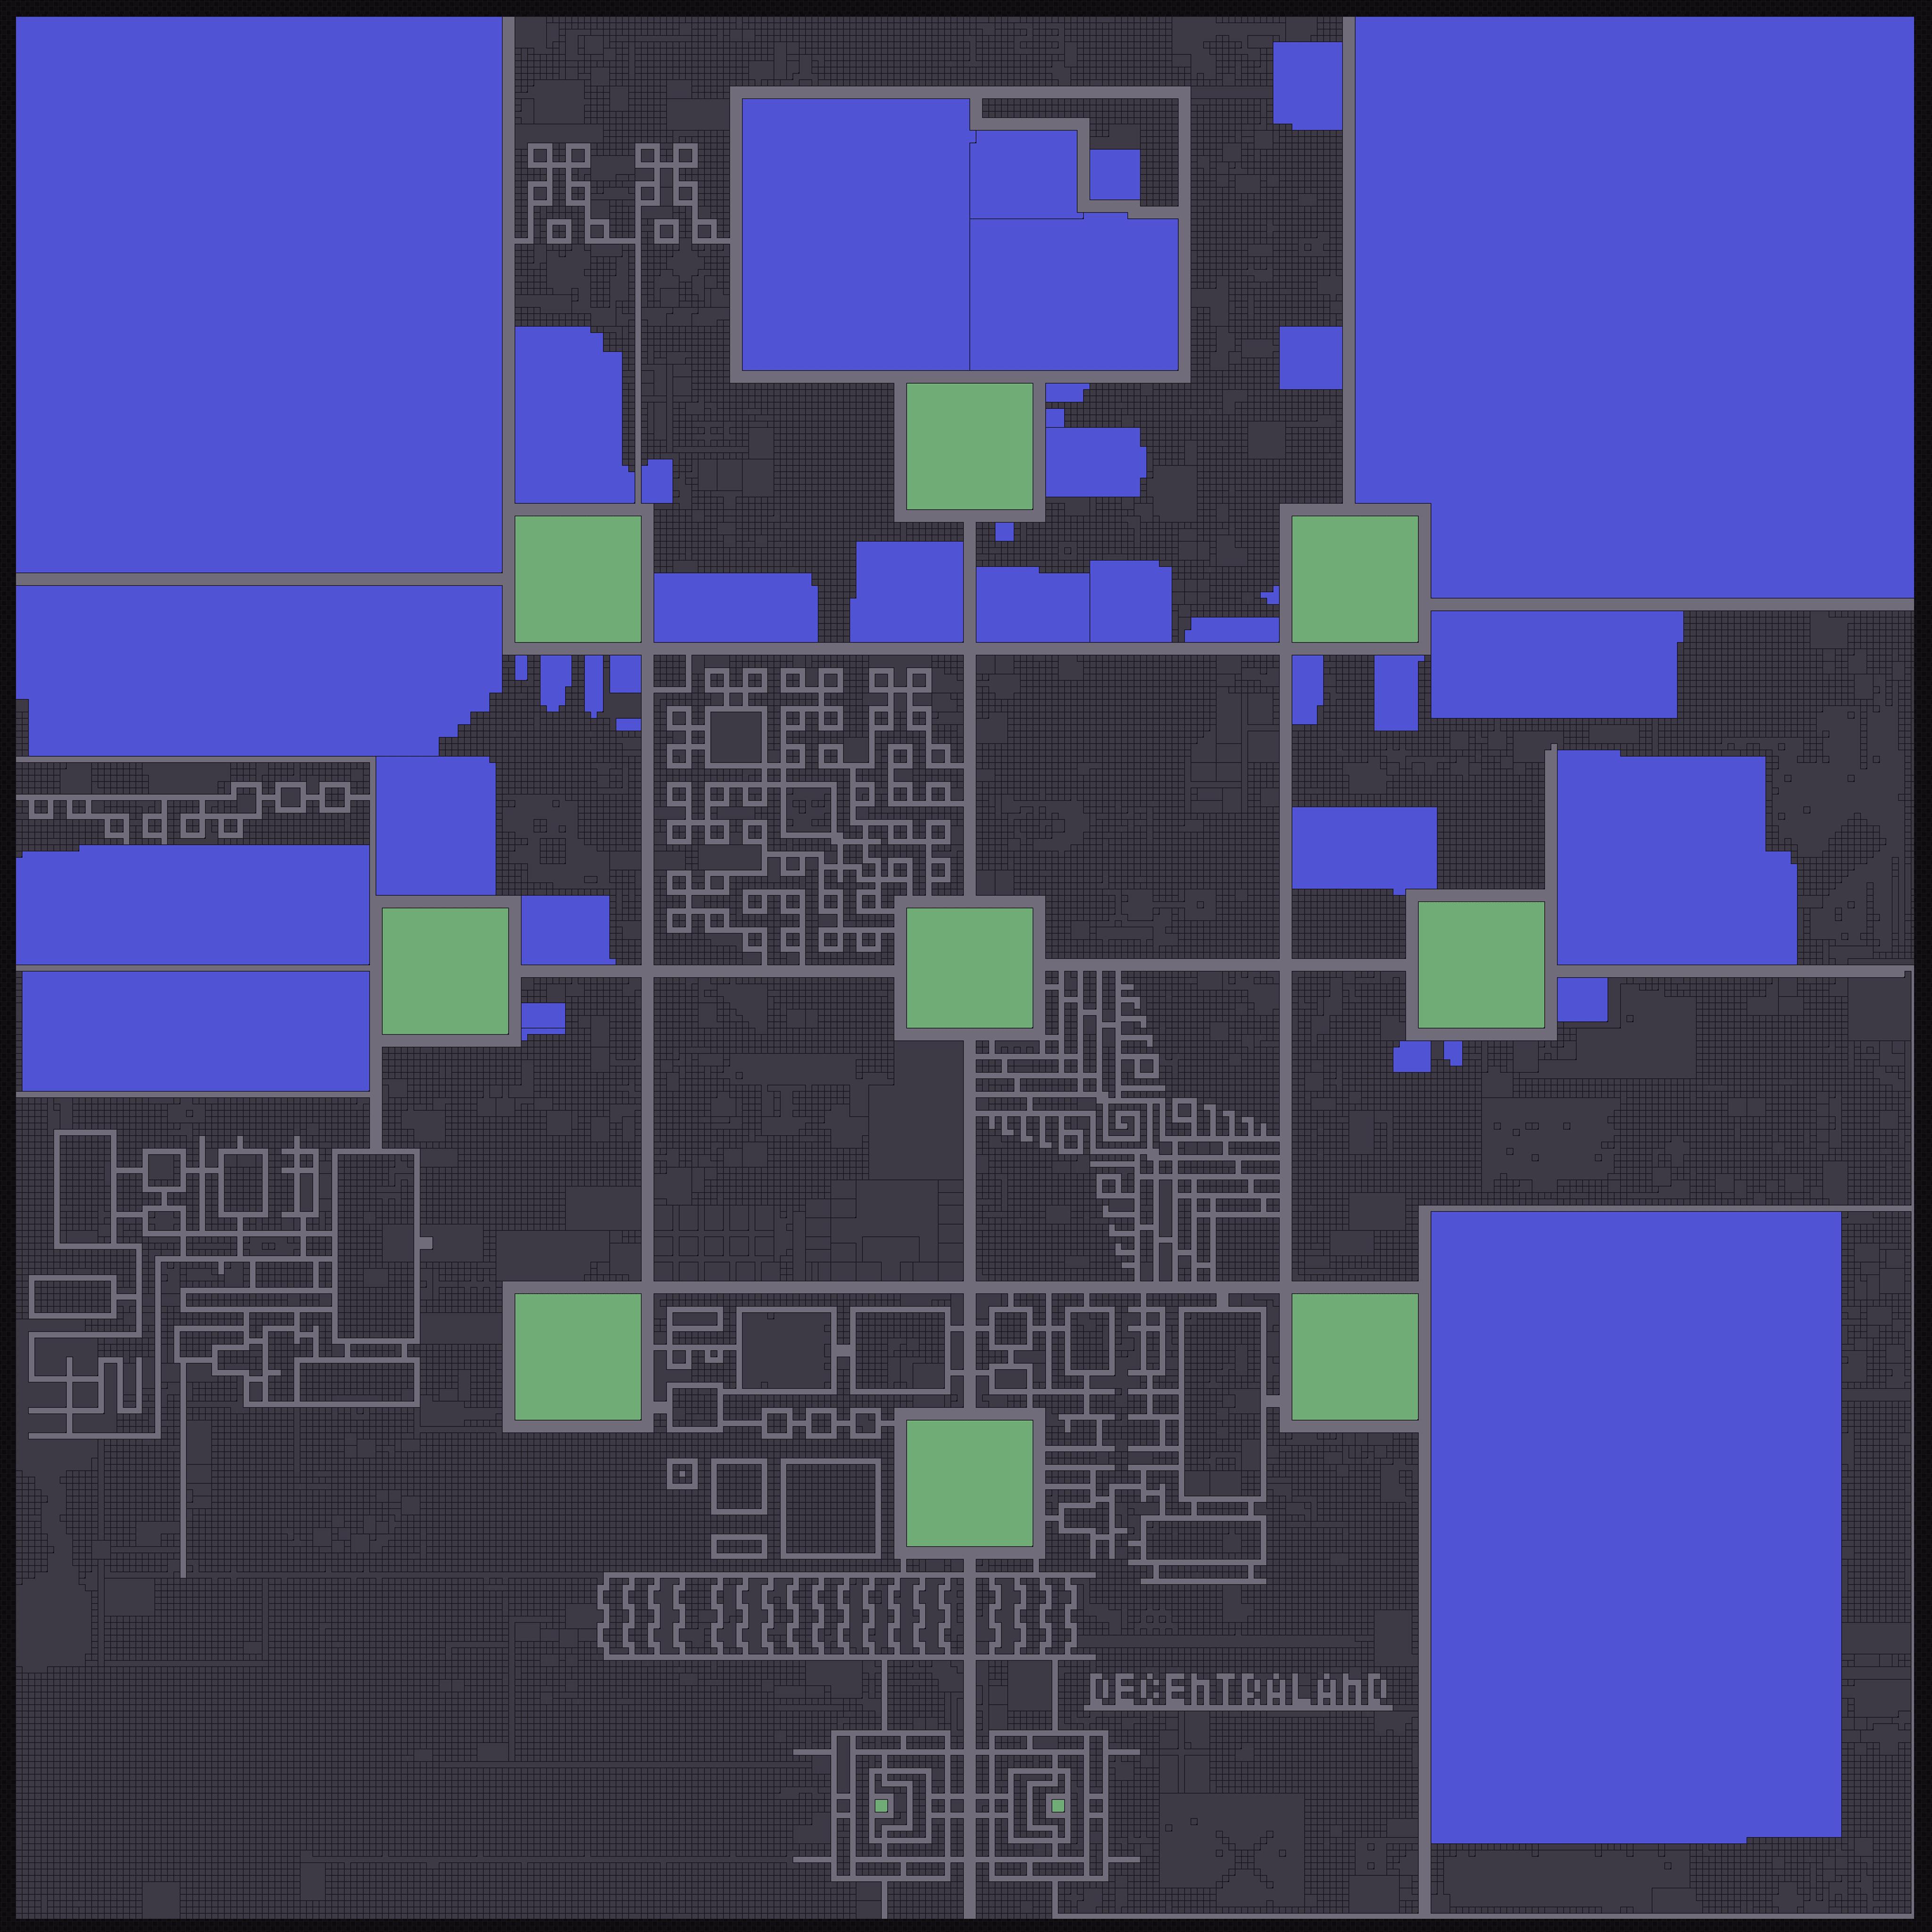 decentraland-map